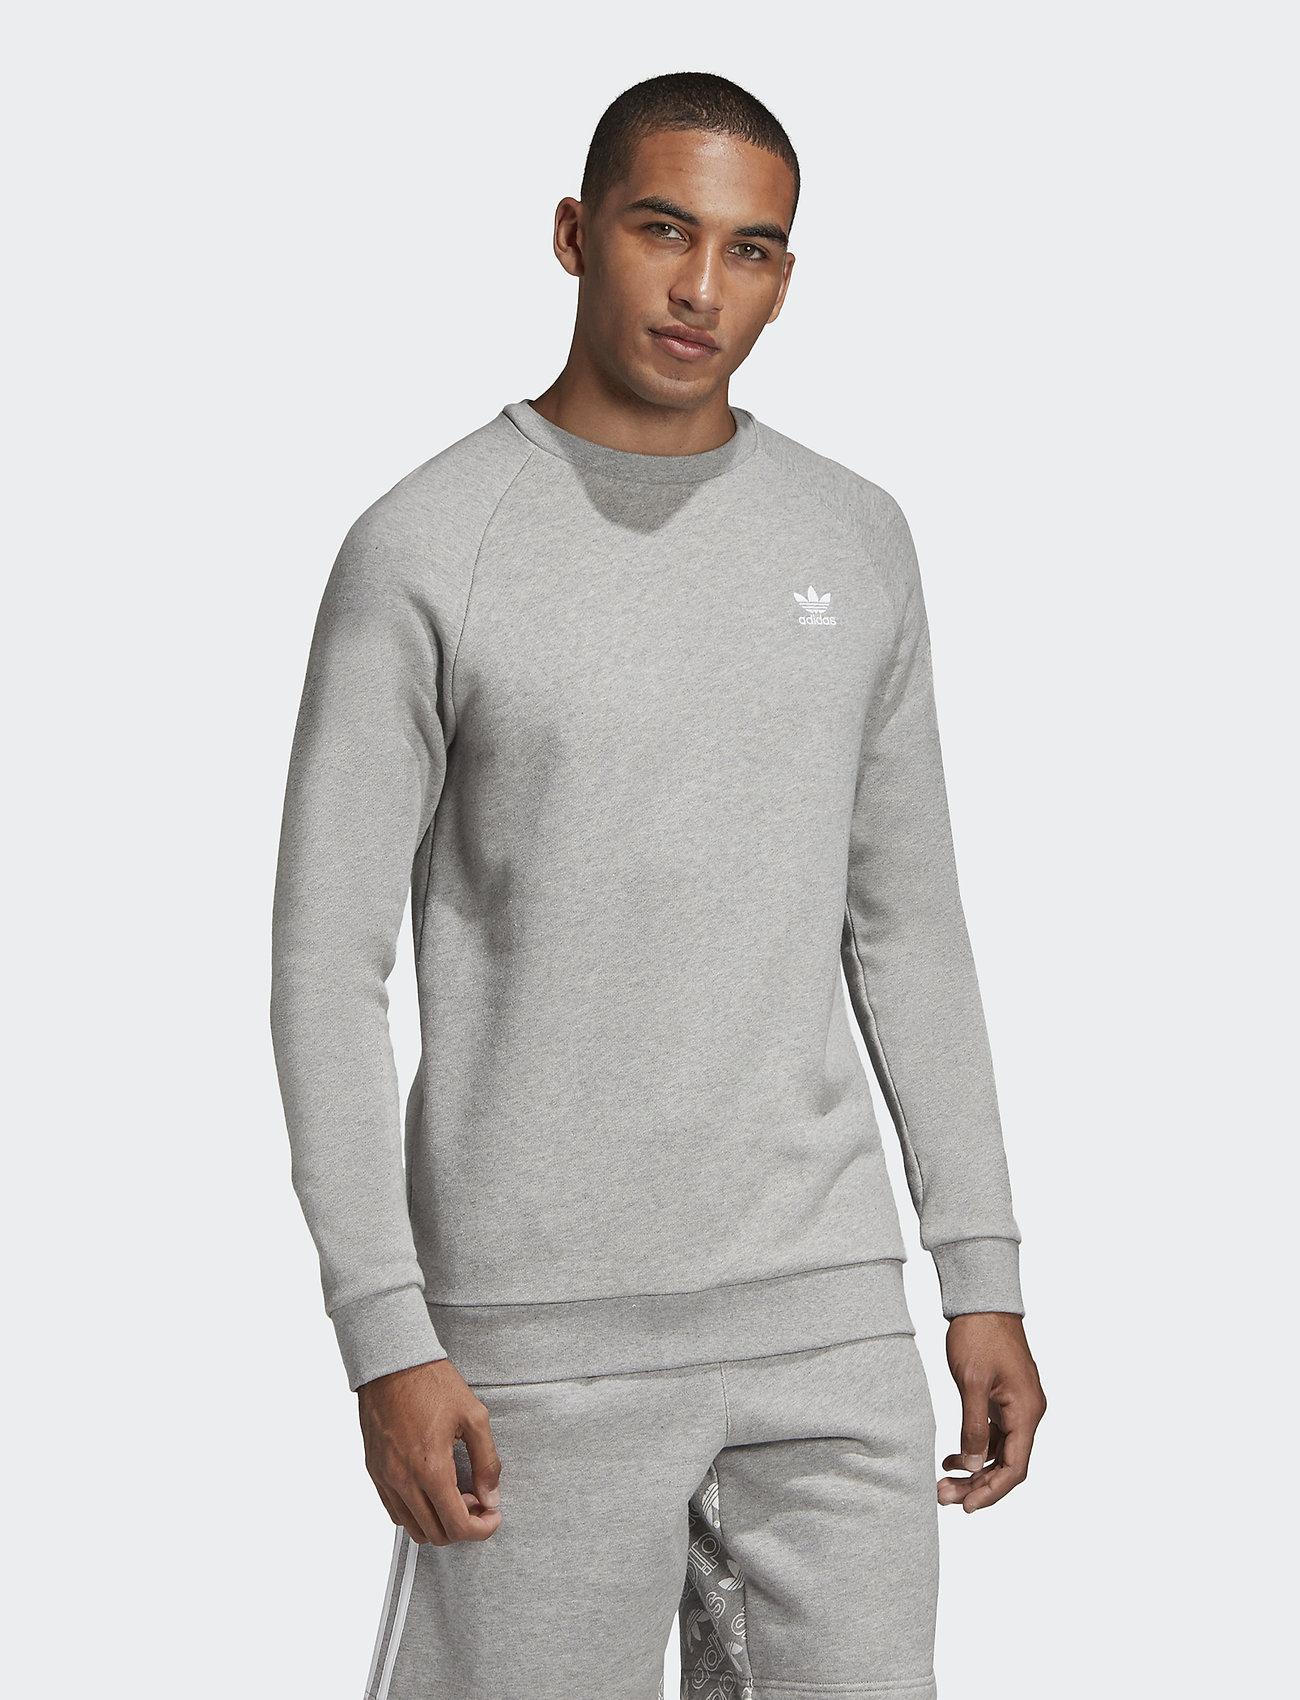 adidas Originals - ESSENTIAL CREW - overdeler - mgreyh - 0